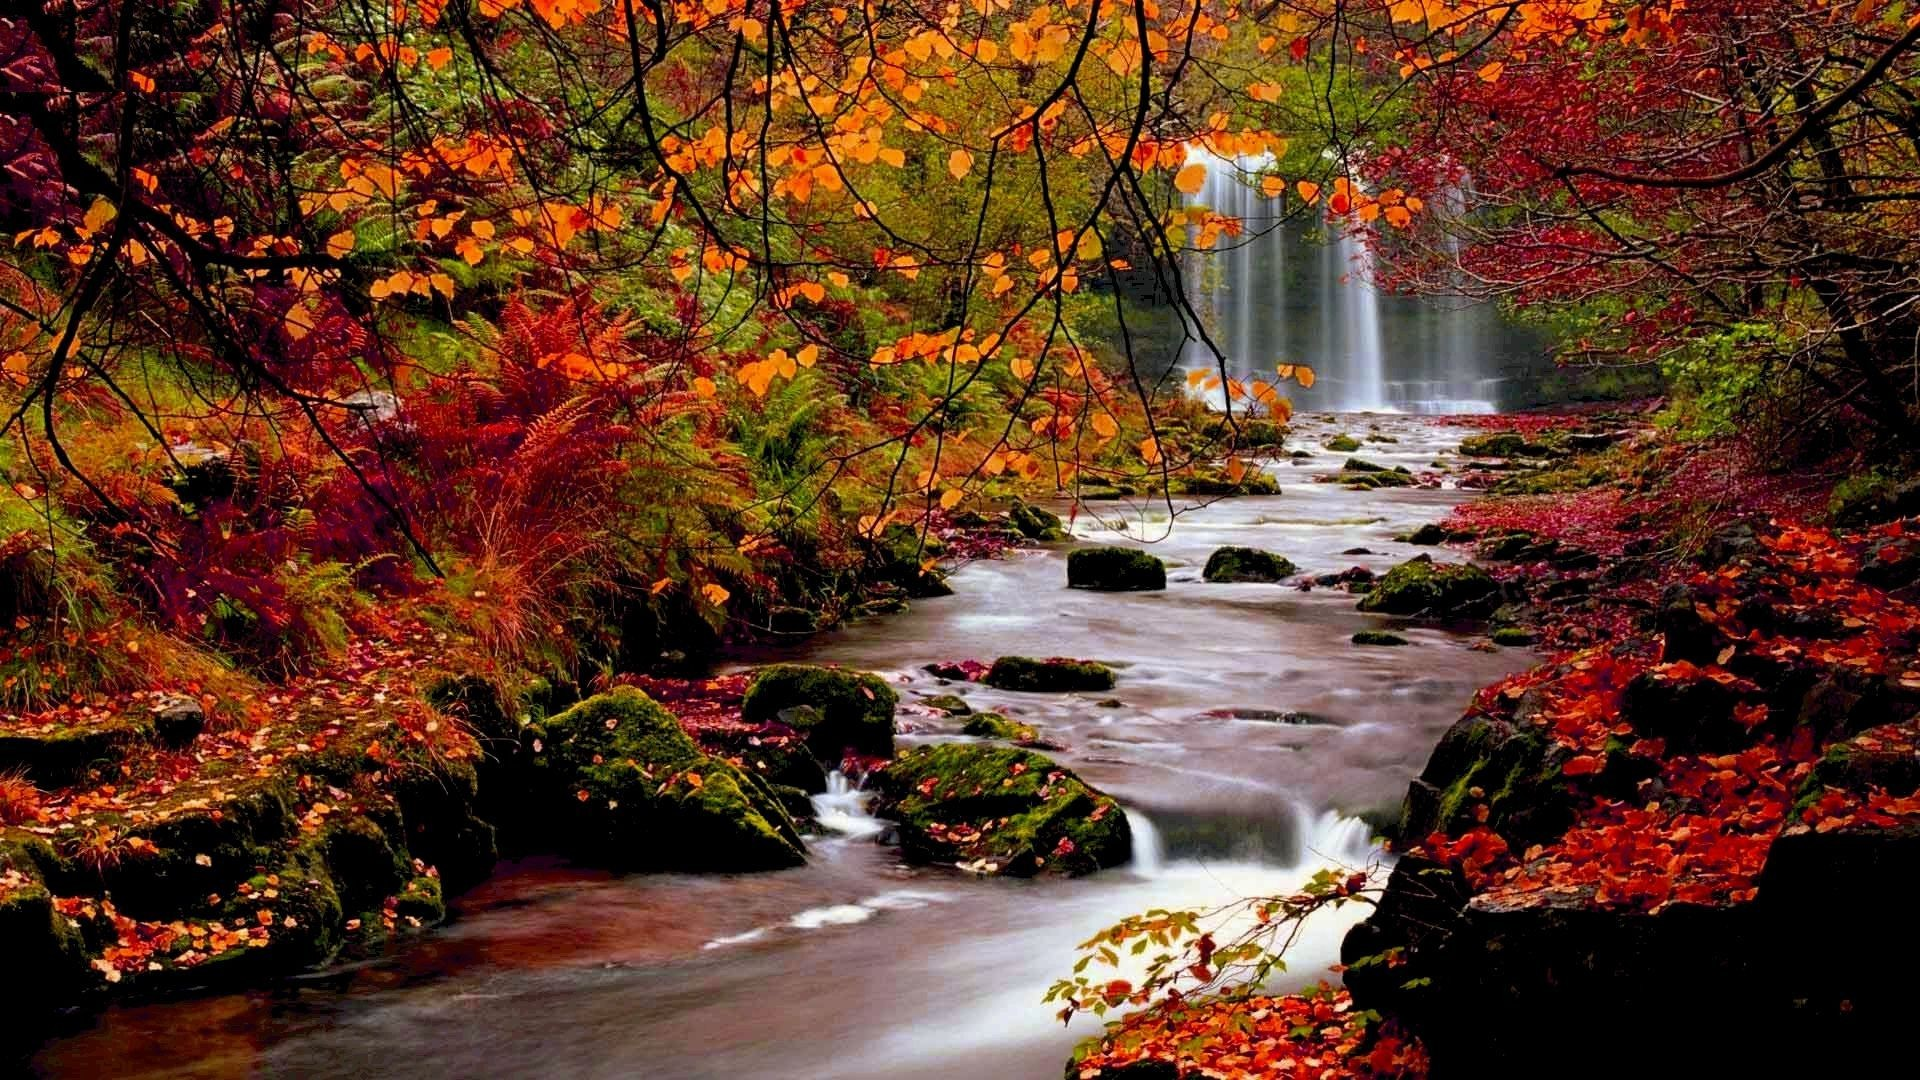 Autumn Tree Wallpaper (61+ Images